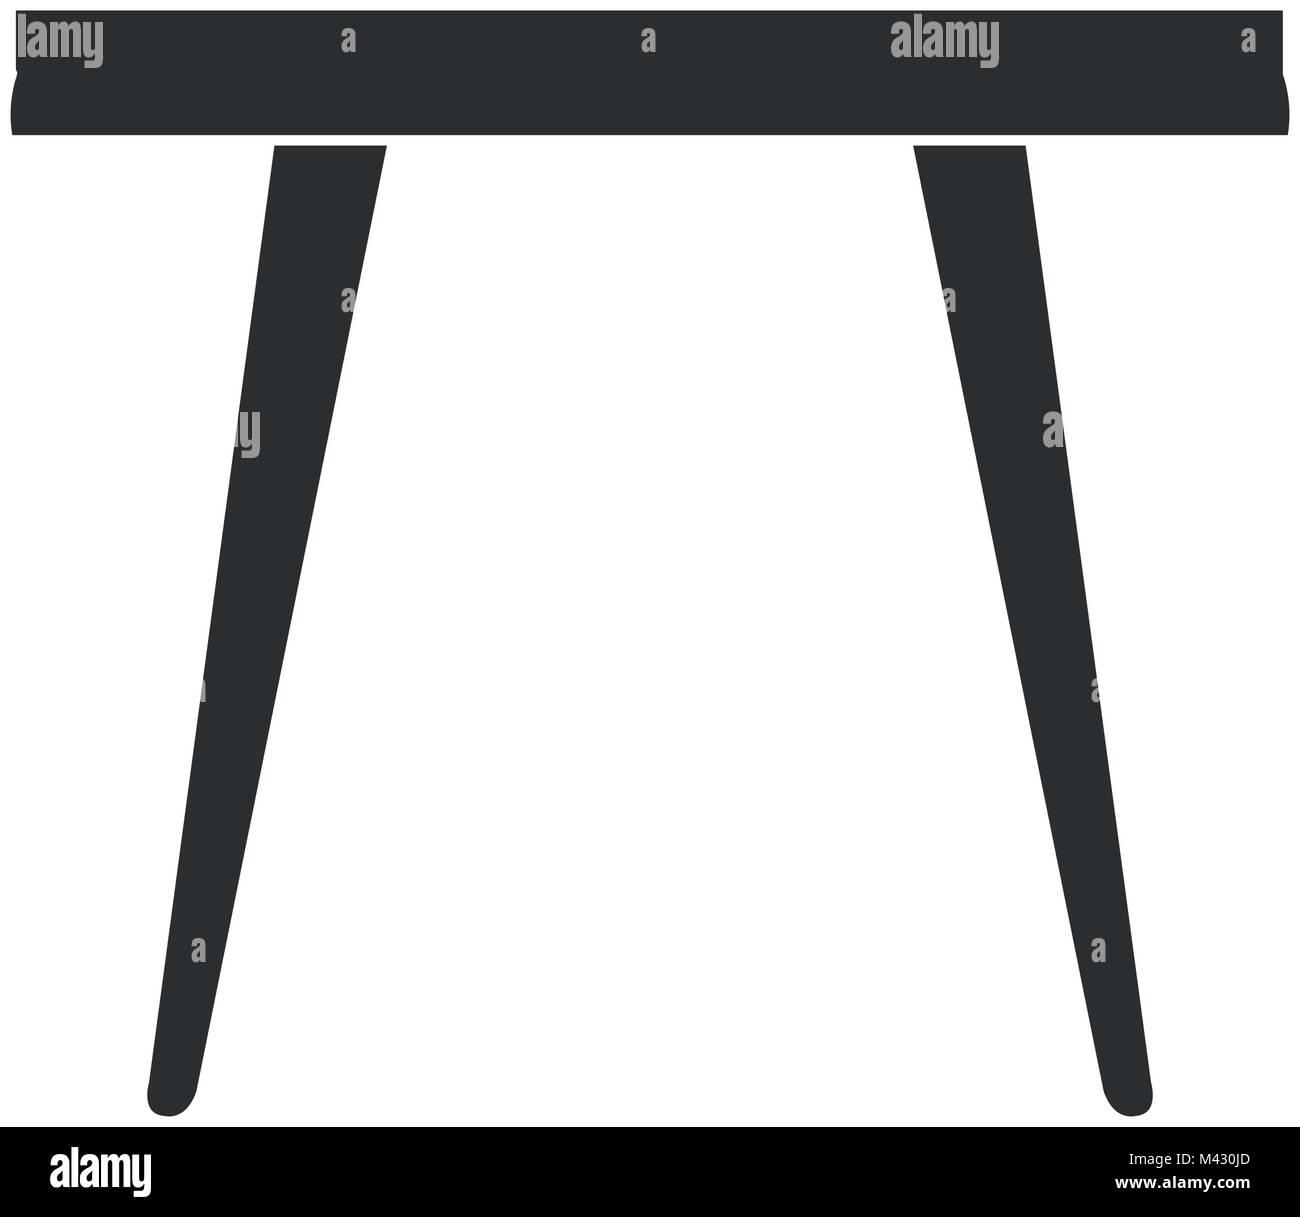 living room center table Stock Vector Art & Illustration, Vector ...